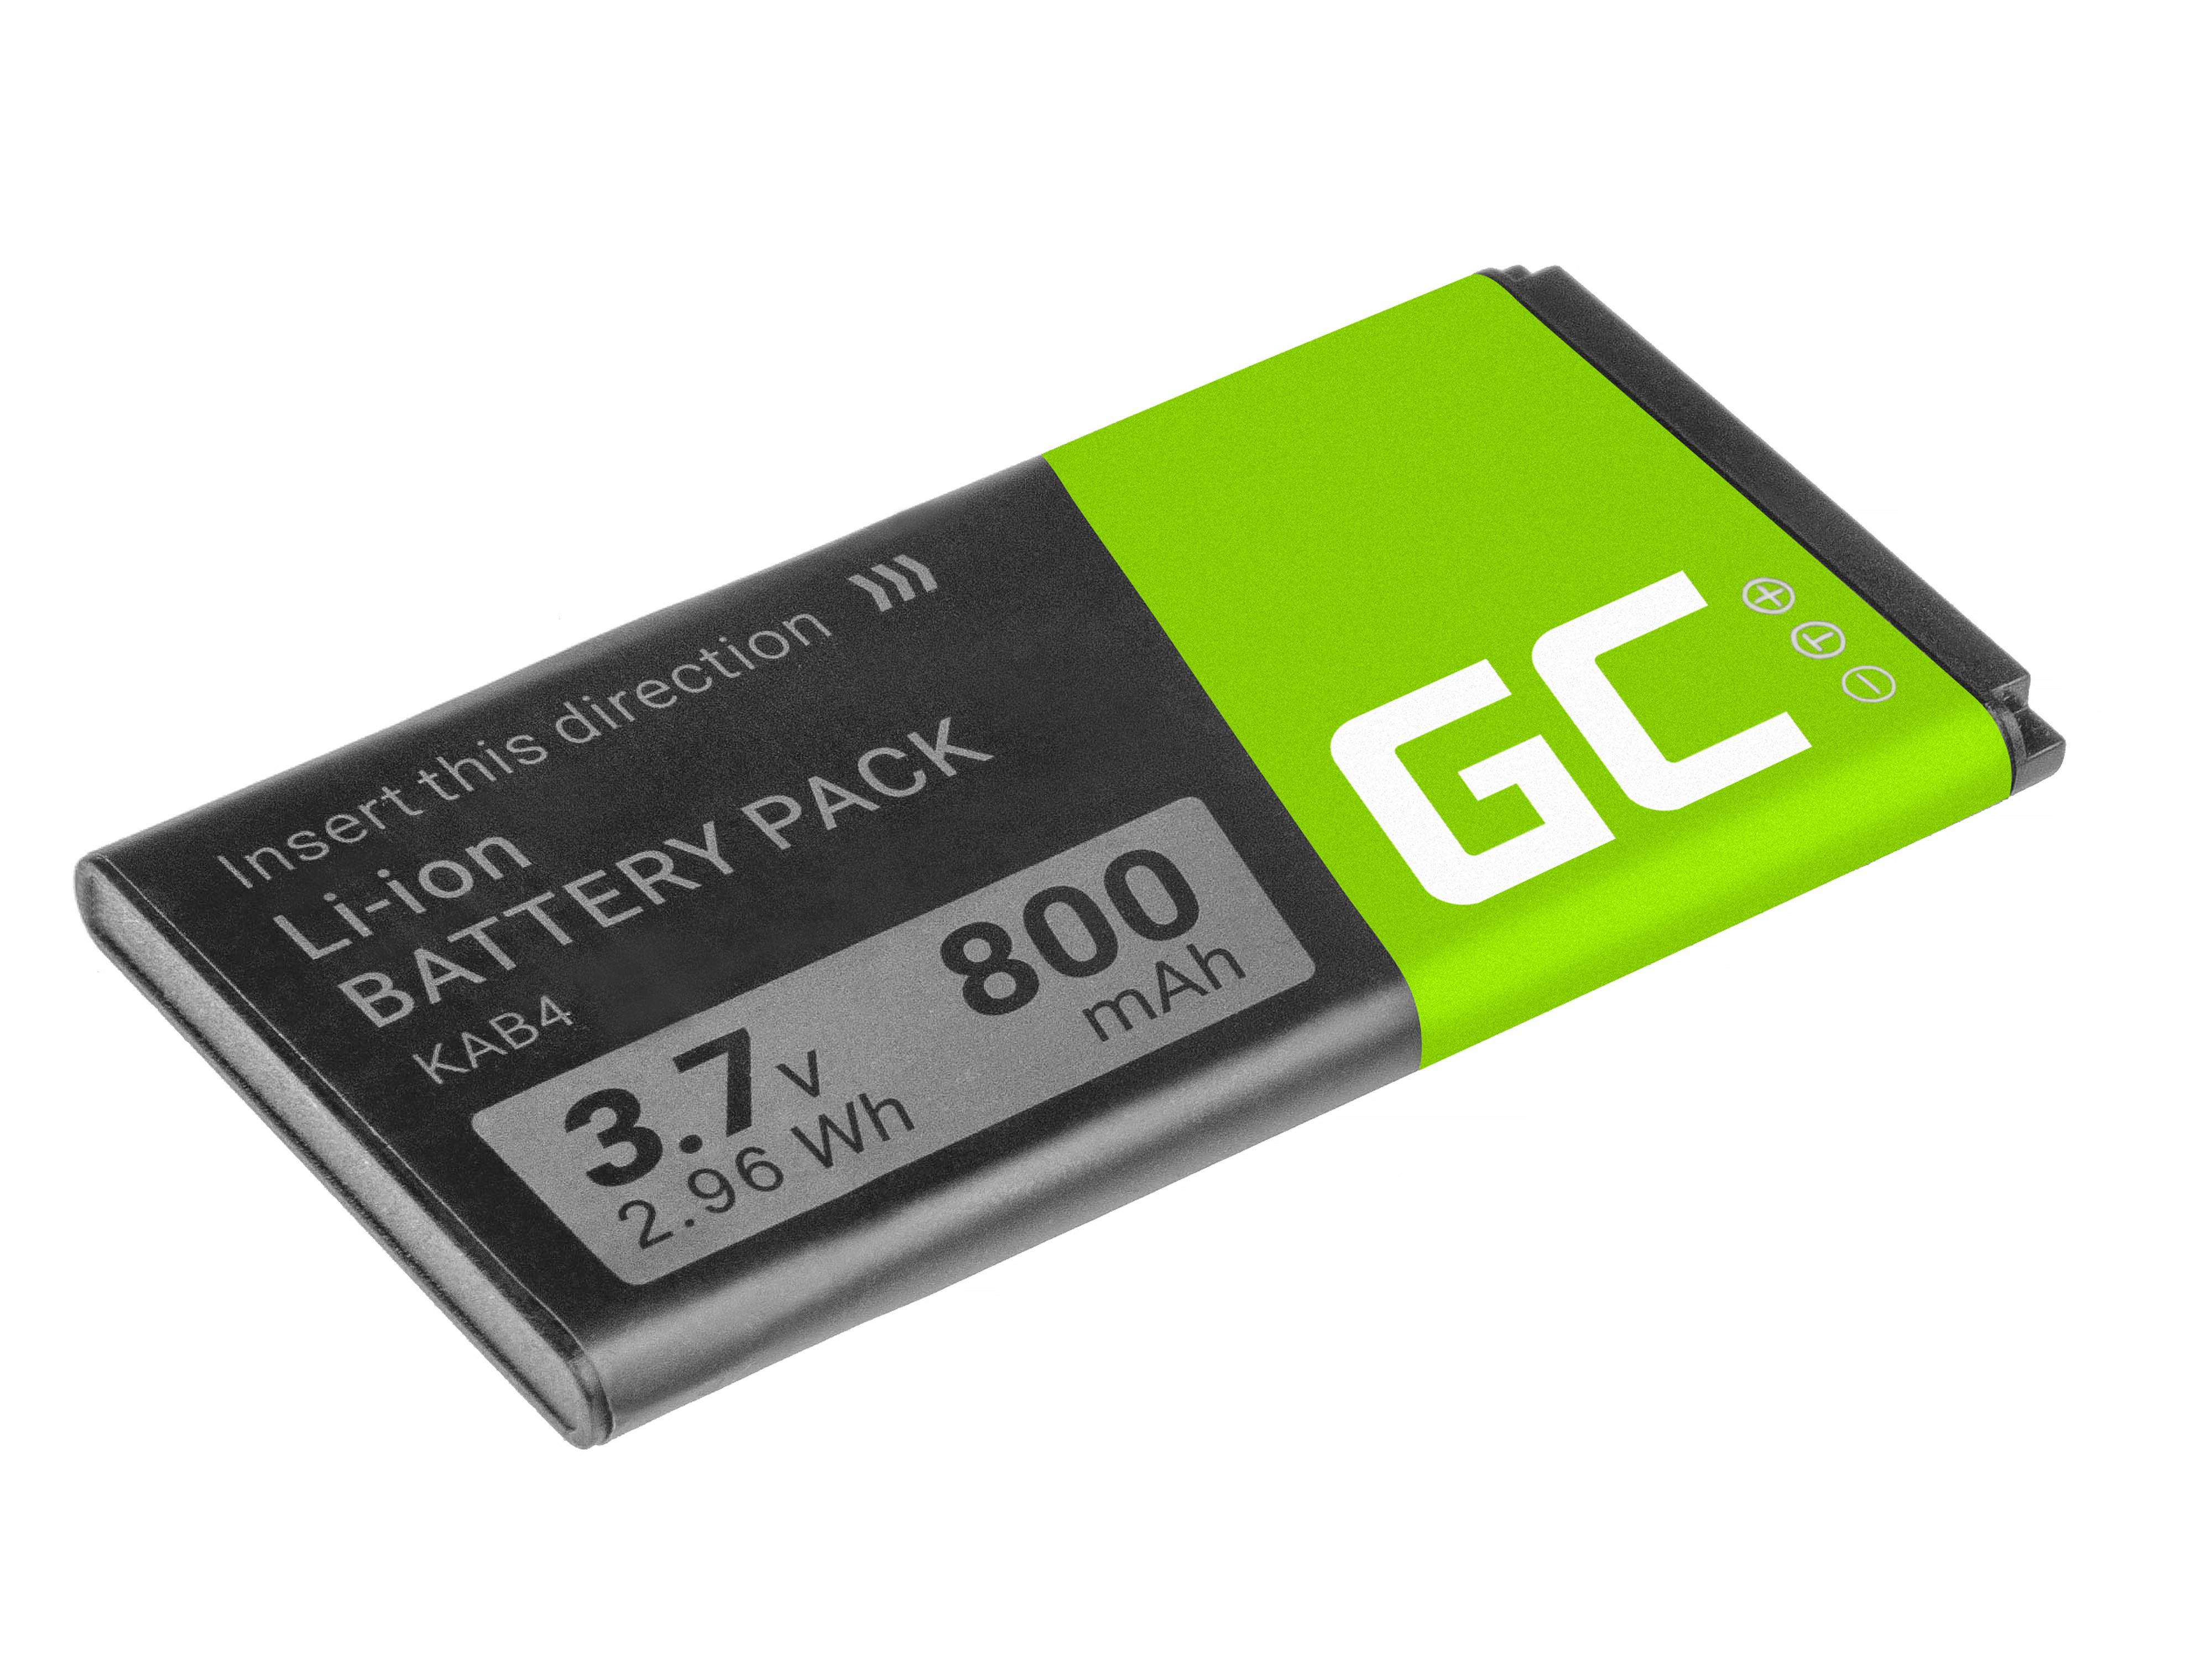 Baterie Green Cell KAB4 Kazam Life B4 Maxcom MM720 1050mAh Li-ion - neoriginální